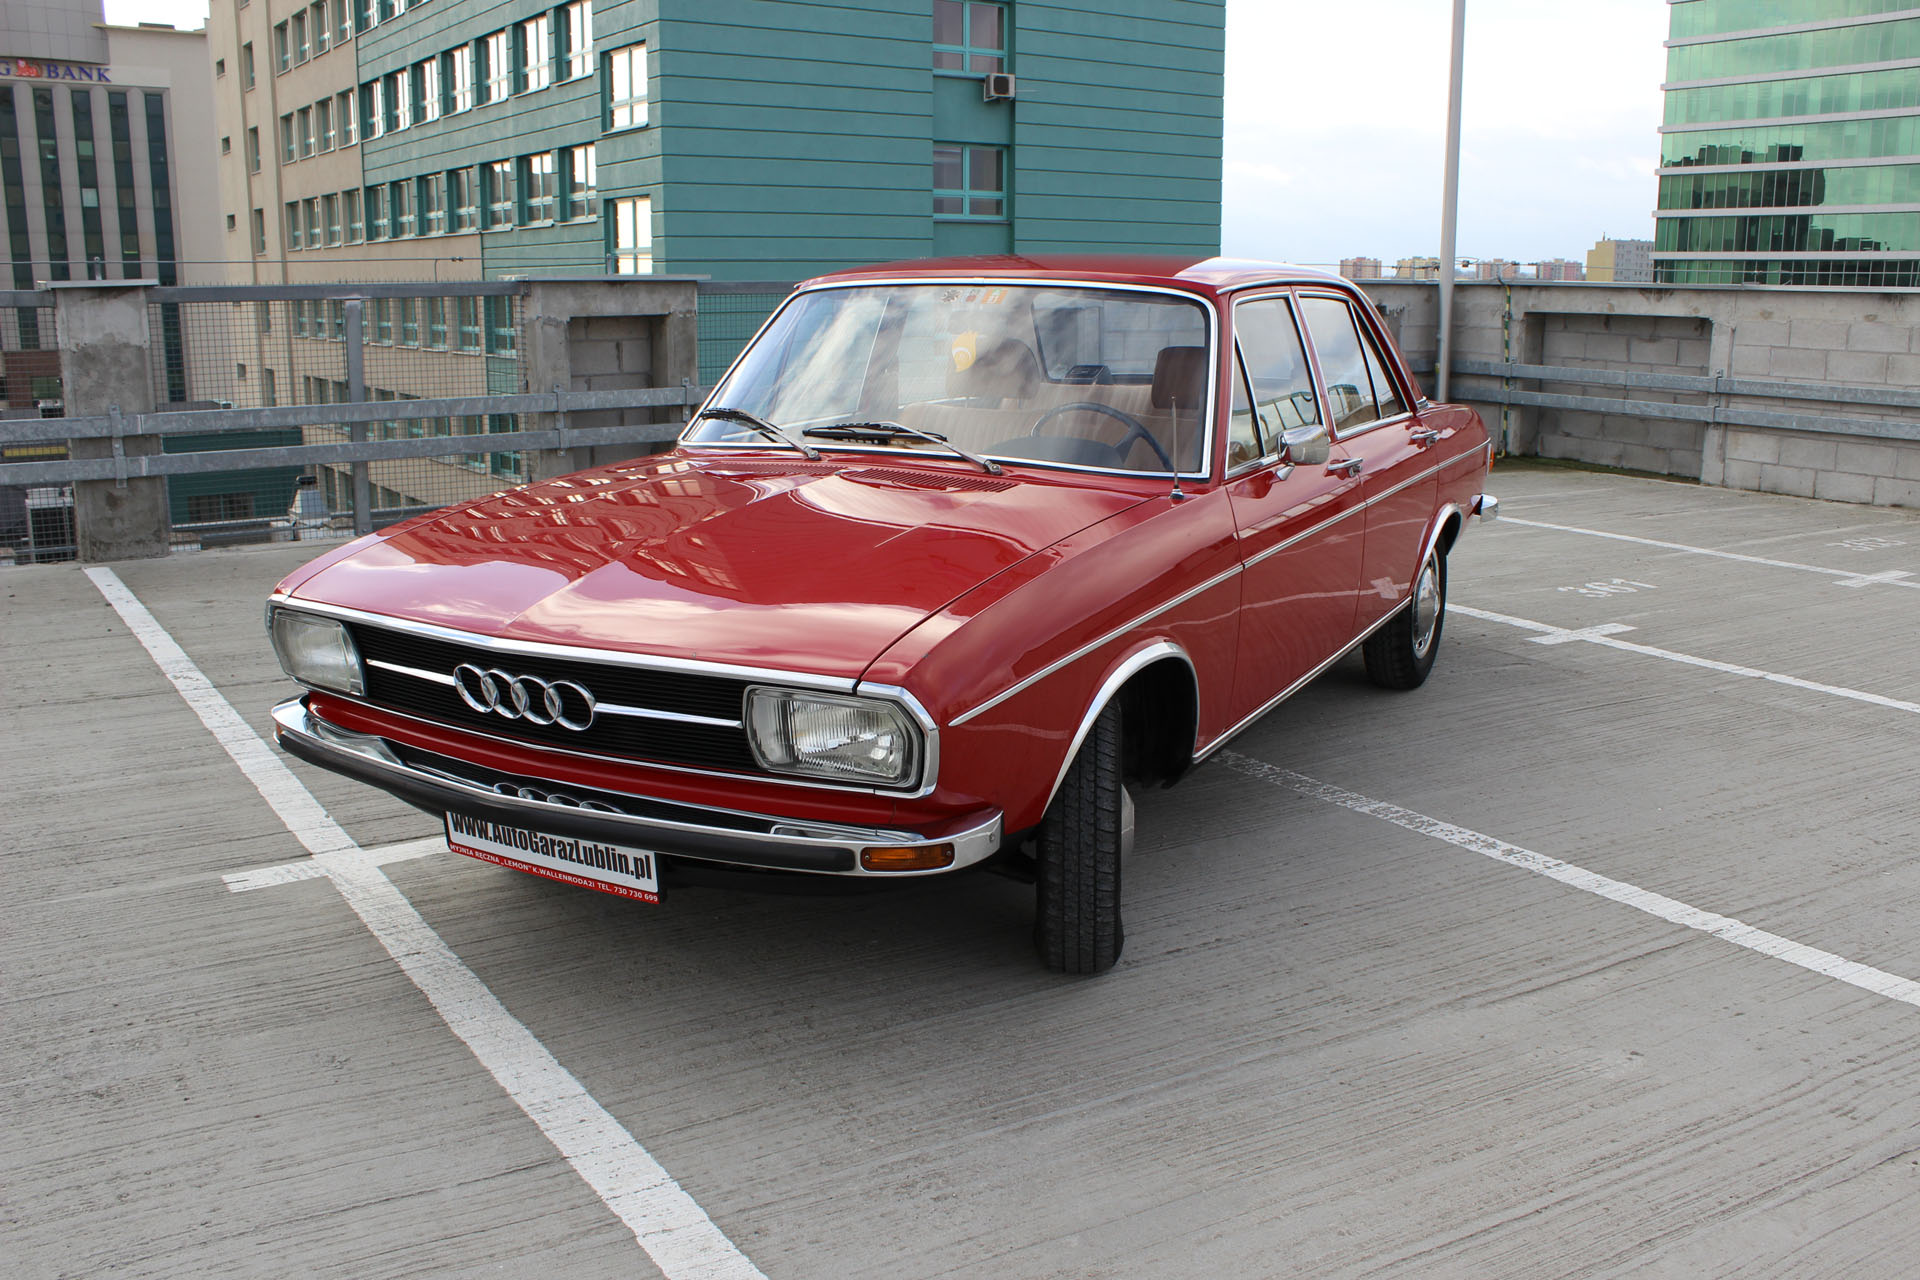 Audi 100 LS 1974 gieldaklasykow pl audi-100ls-02